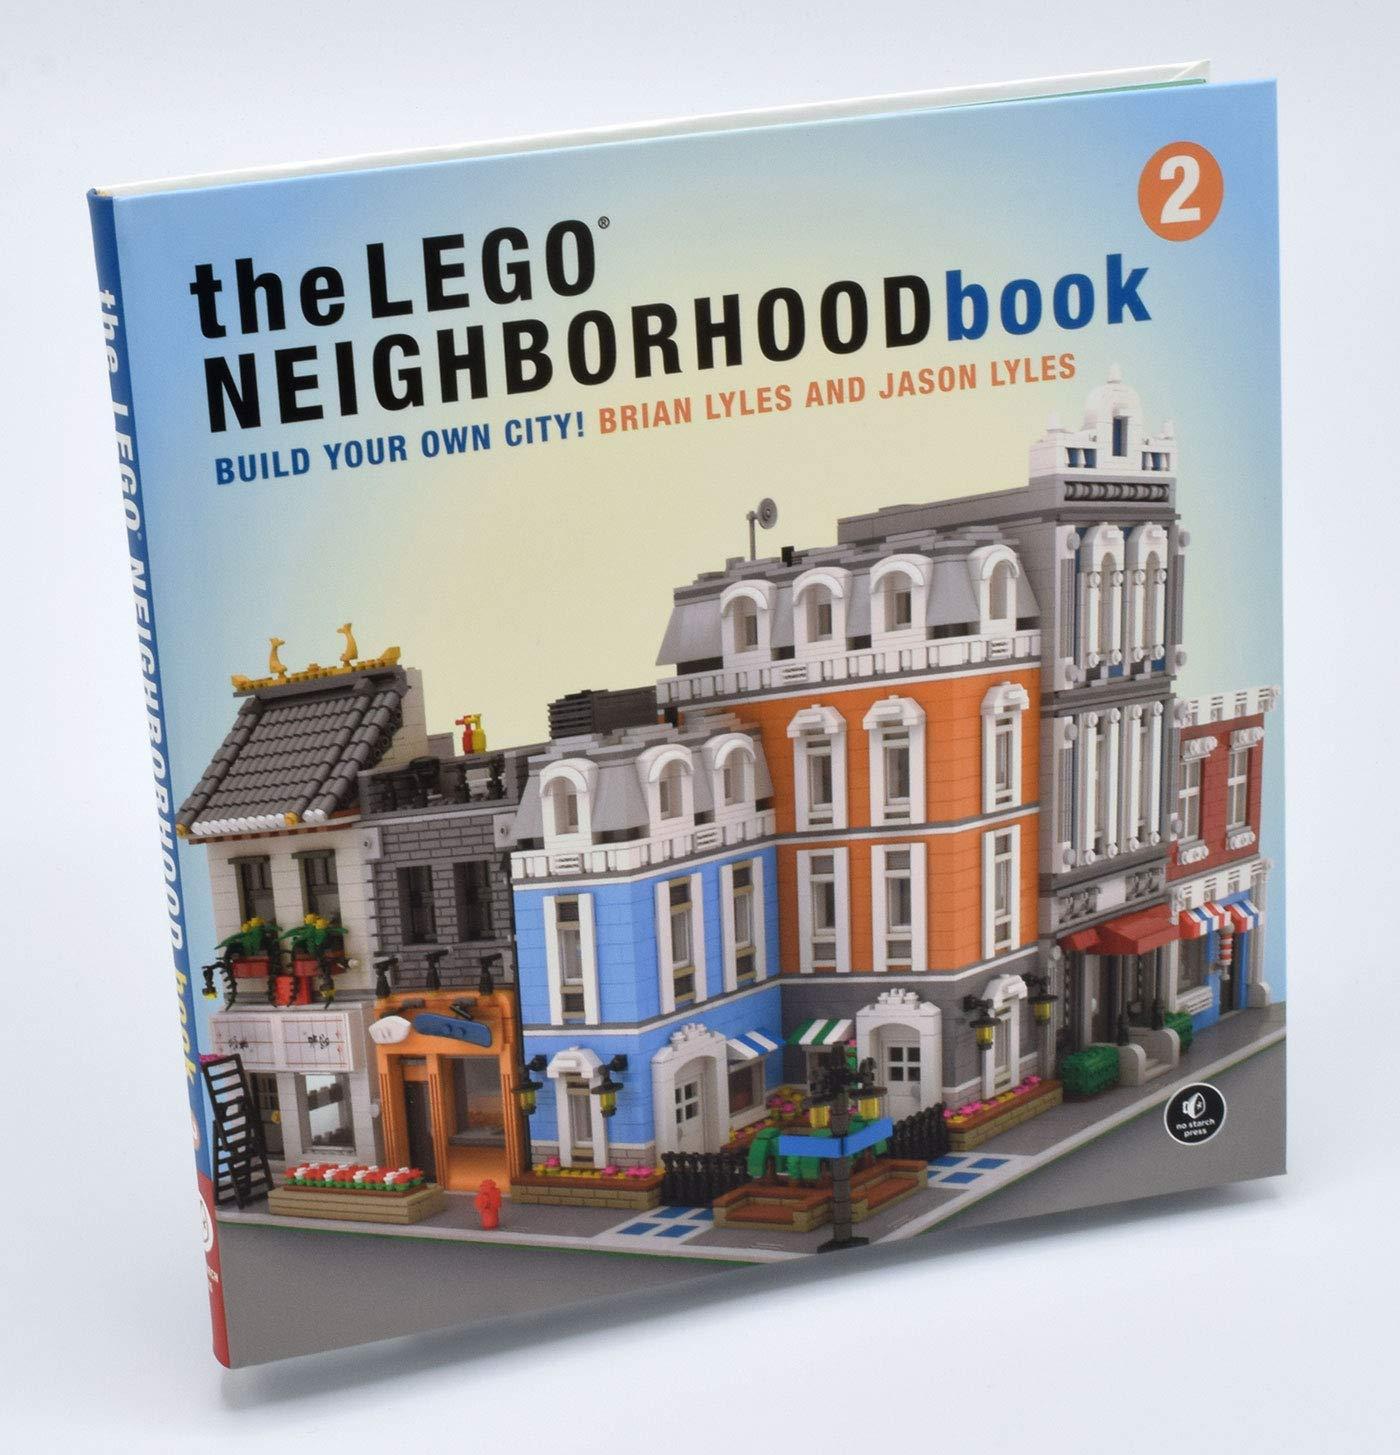 LEGO Neighborhood Book 2, The Build Your Own City!: Amazon.co.uk: Brian  Lyles, Jason Lyles: 9781593279301: Books